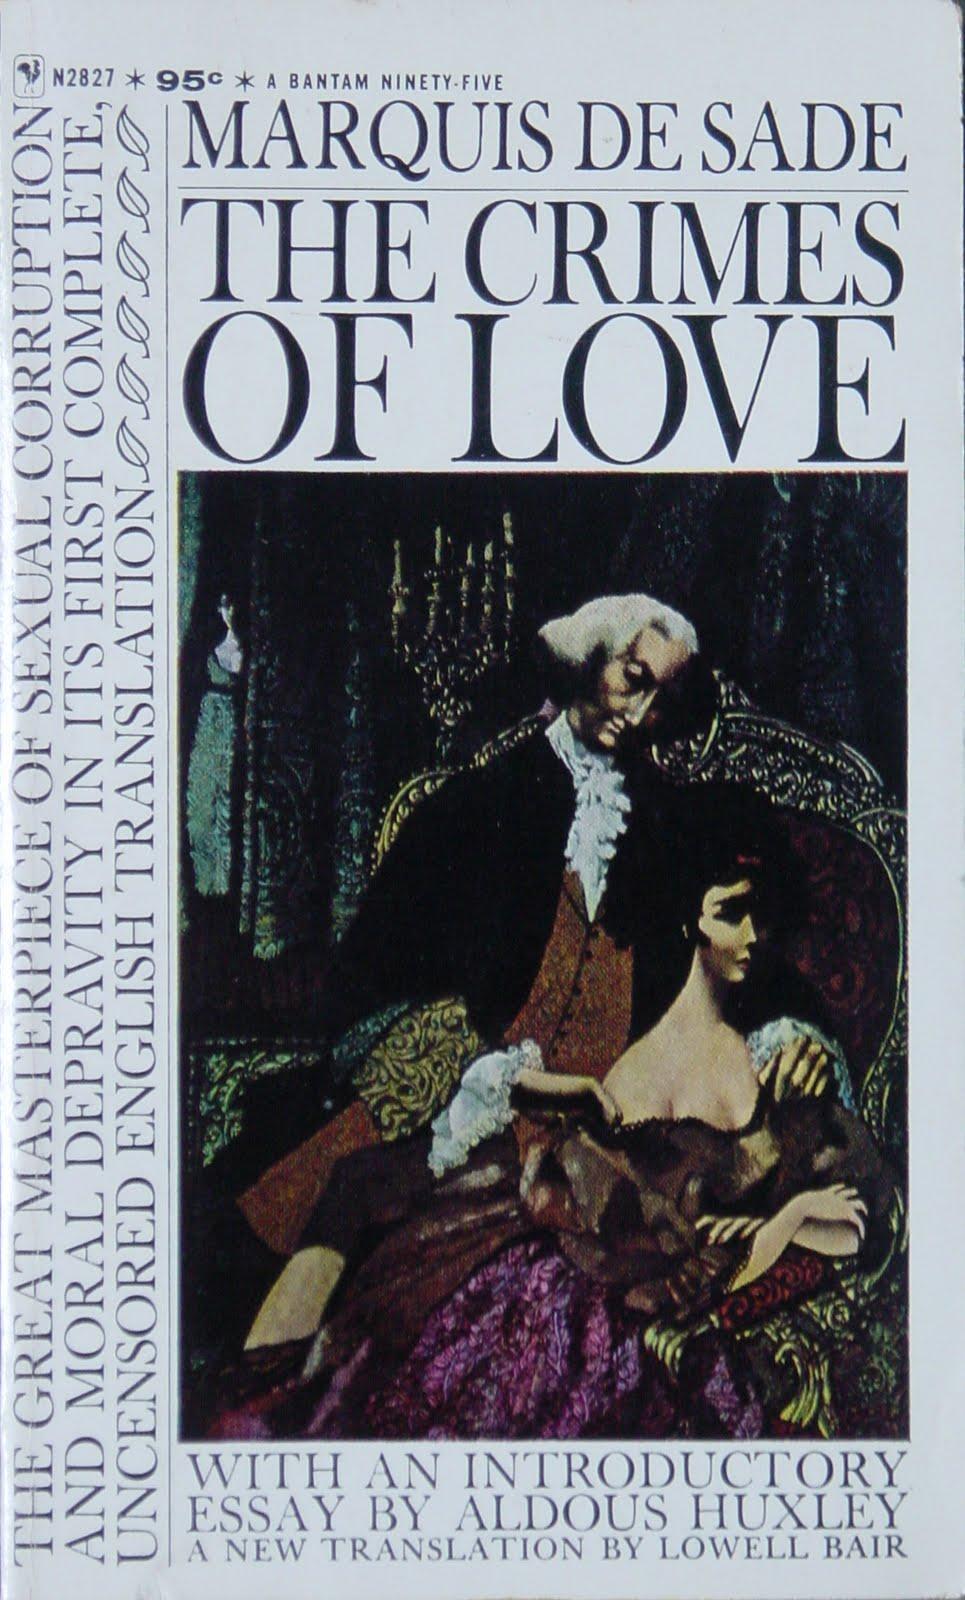 [sade_marquis_de_-_the_crimes_of_love_01.jpg]